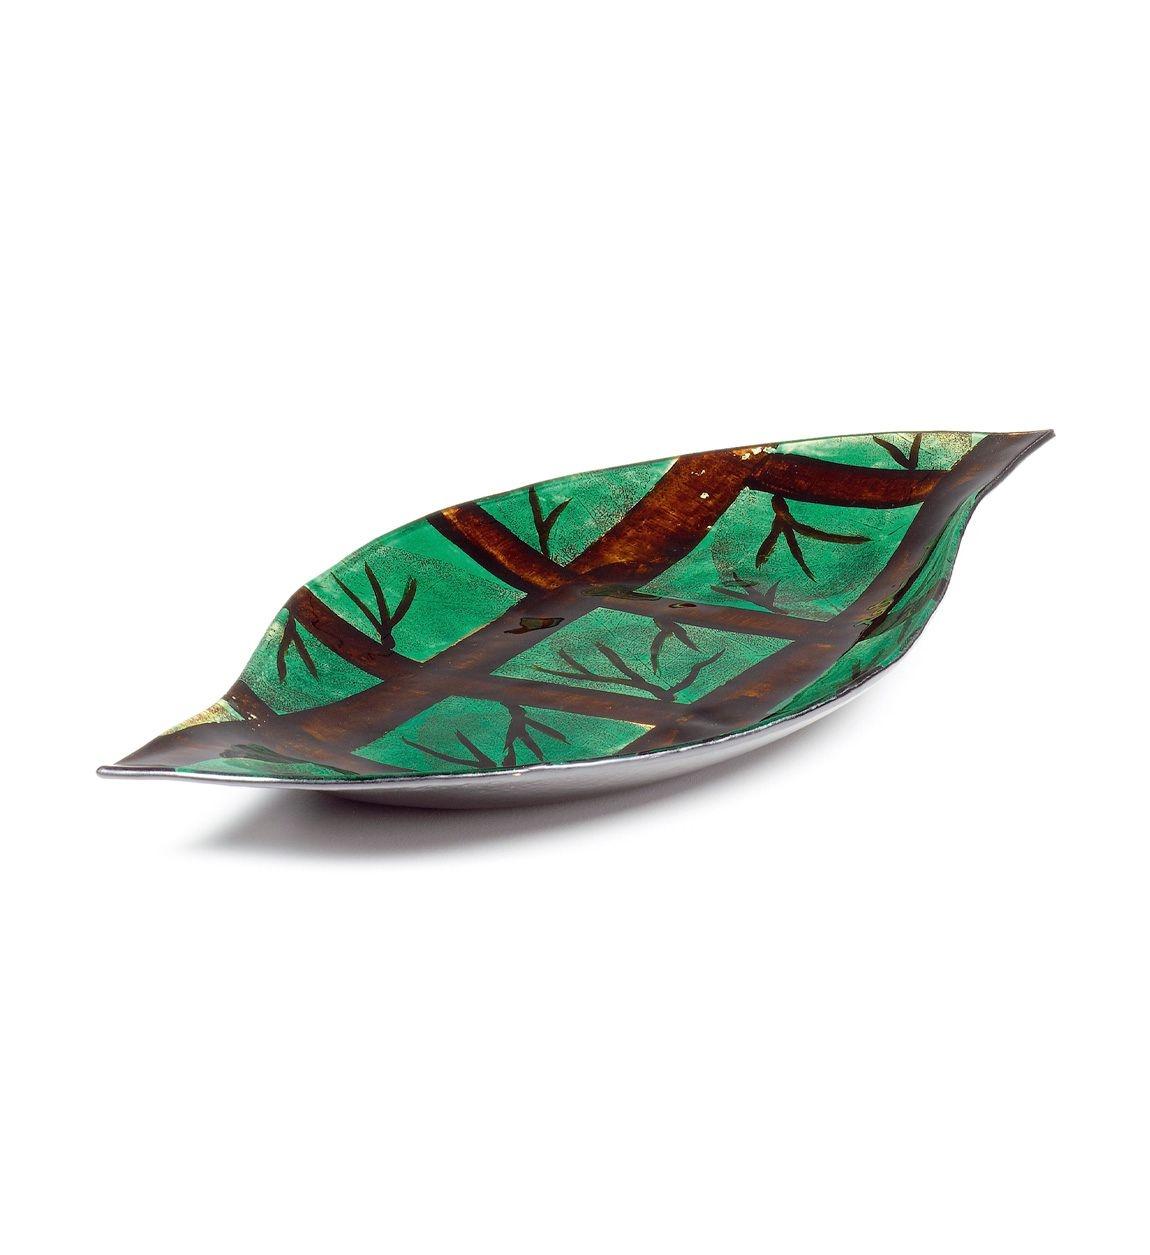 Platou decorativ din sticla Arizona Verde / Maro, L41xl22xH3,5 cm poza